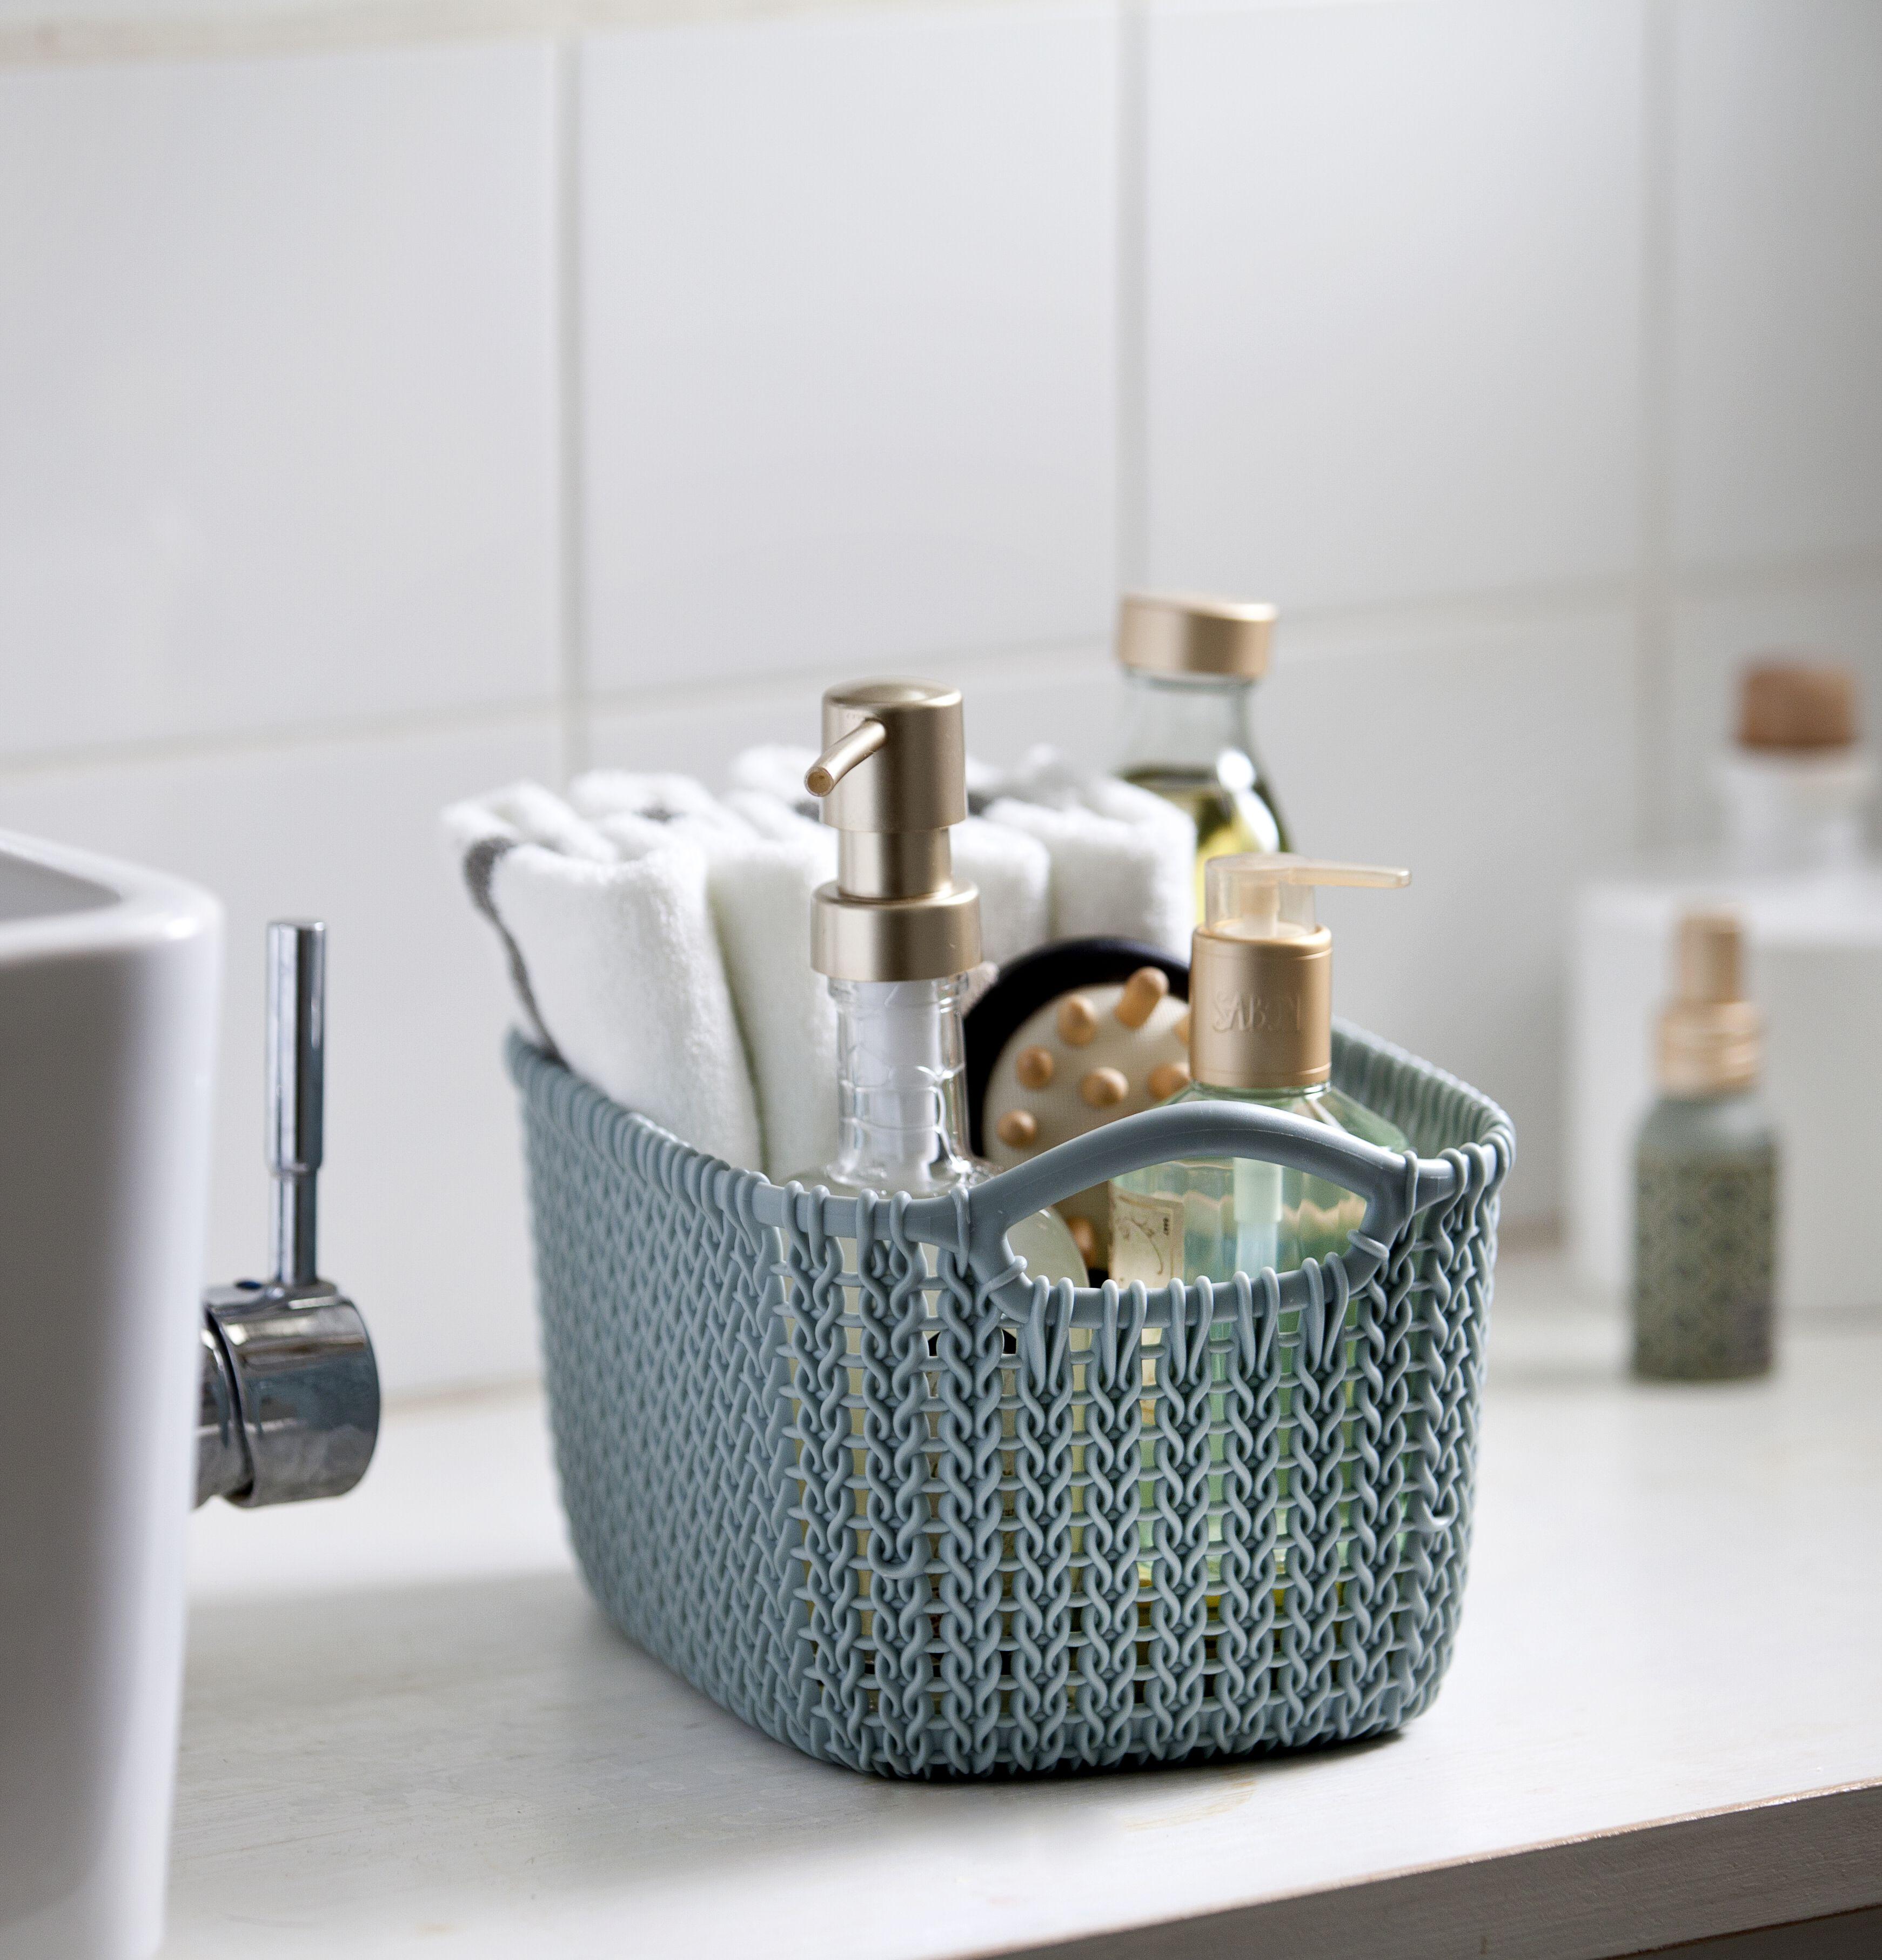 Organiseer je badkamerspullen in een mooi mandje van #KnitByCurver ...